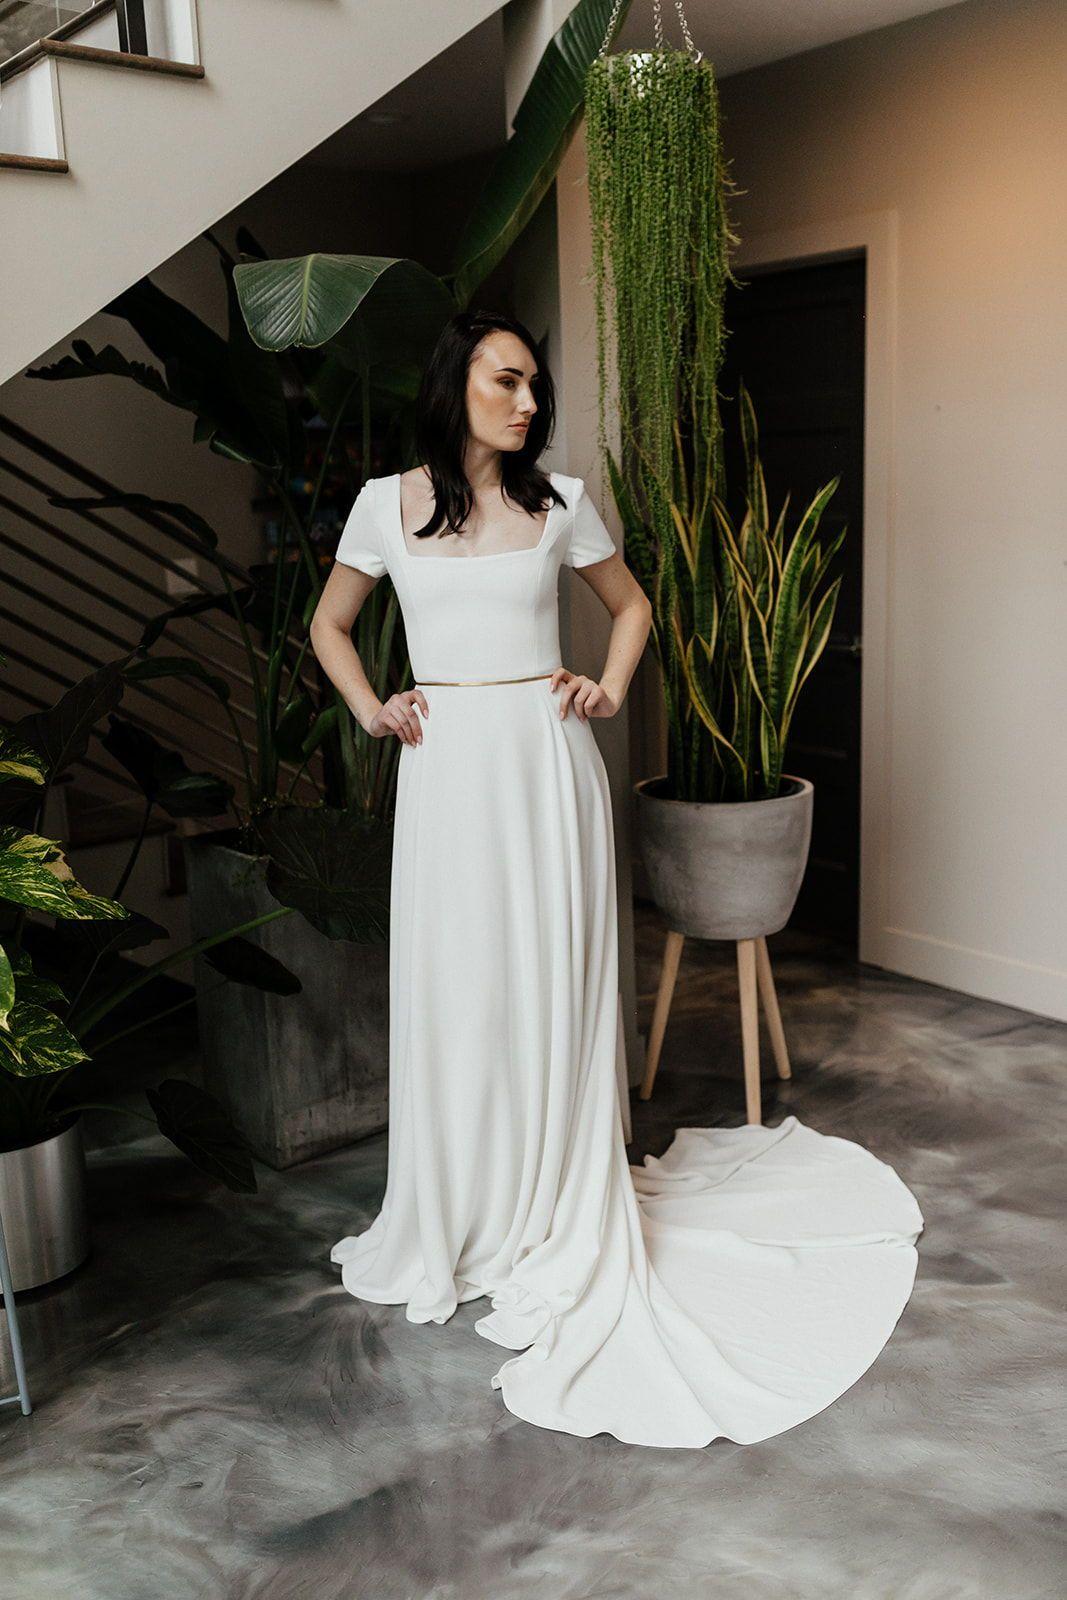 Crepe Modest Wedding Dress In 2020 Short Sleeve Wedding Dress Wedding Dresses Corset Wedding Dresses Unique